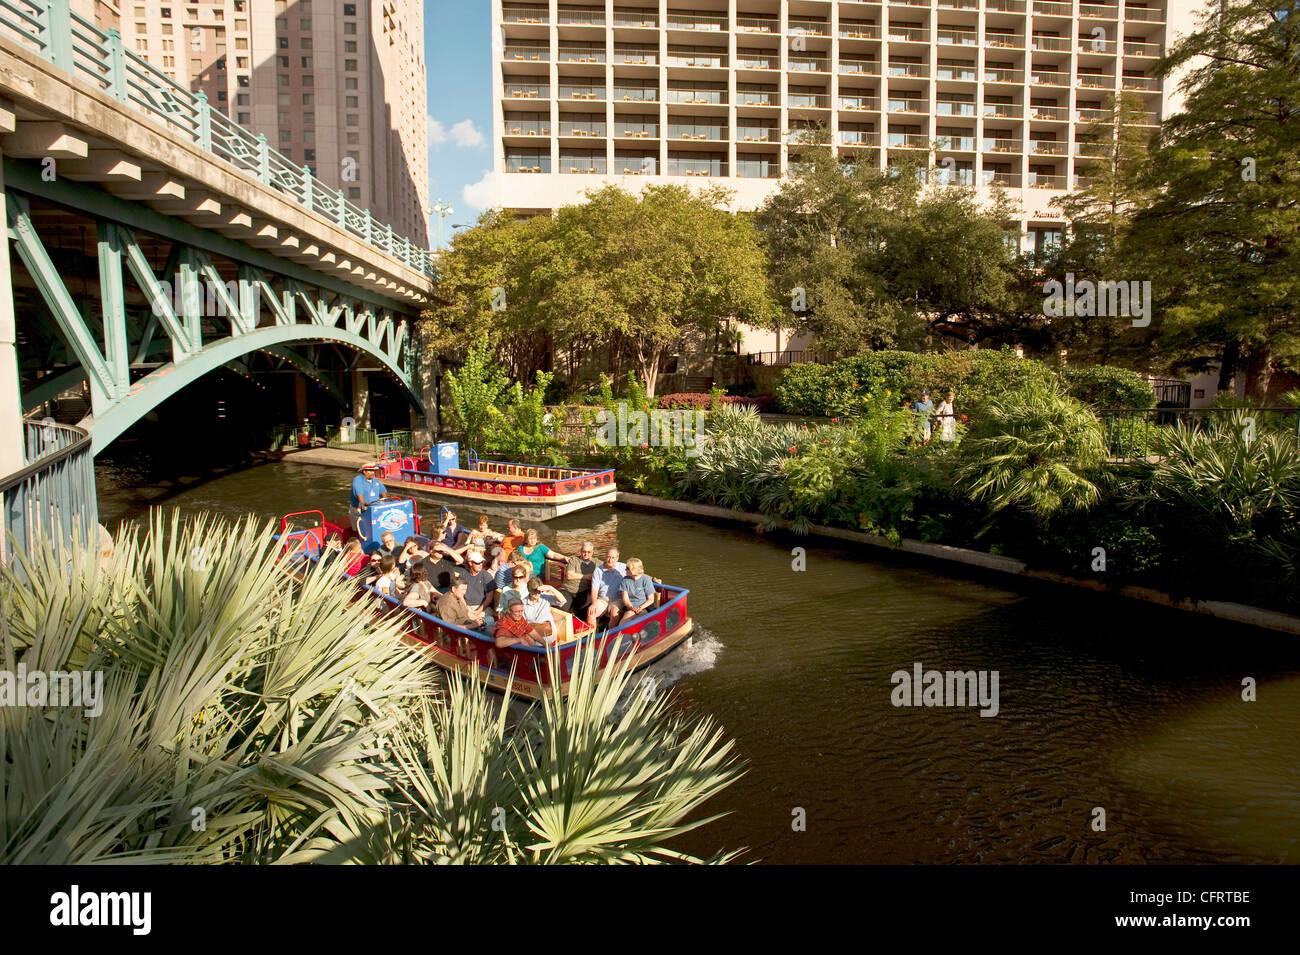 USA, Texas, San Antonio, Riverwalk, garden, gondolas, tourists, E ...